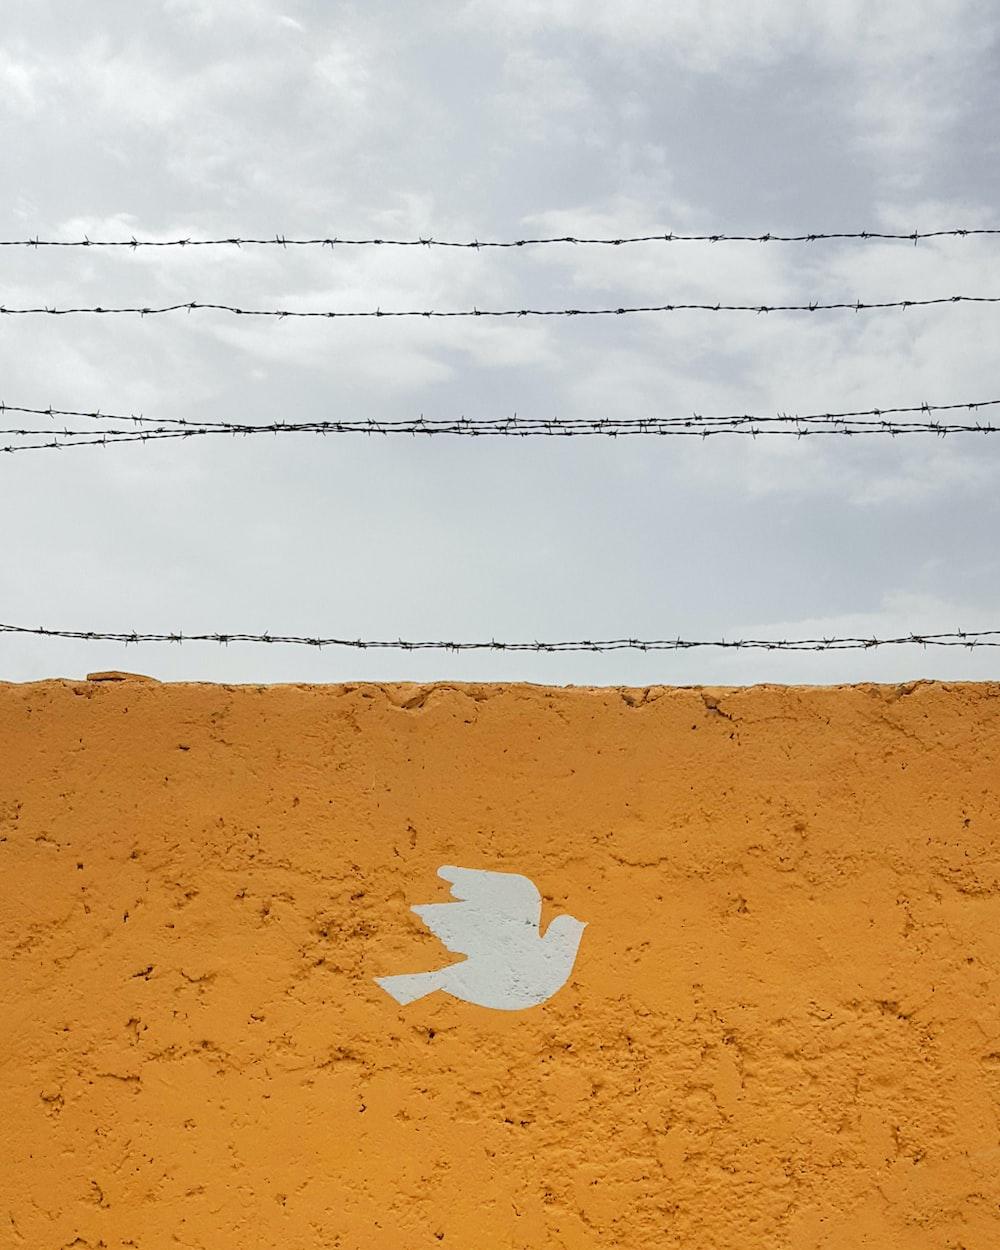 orange and white bird graphic wall during daytime